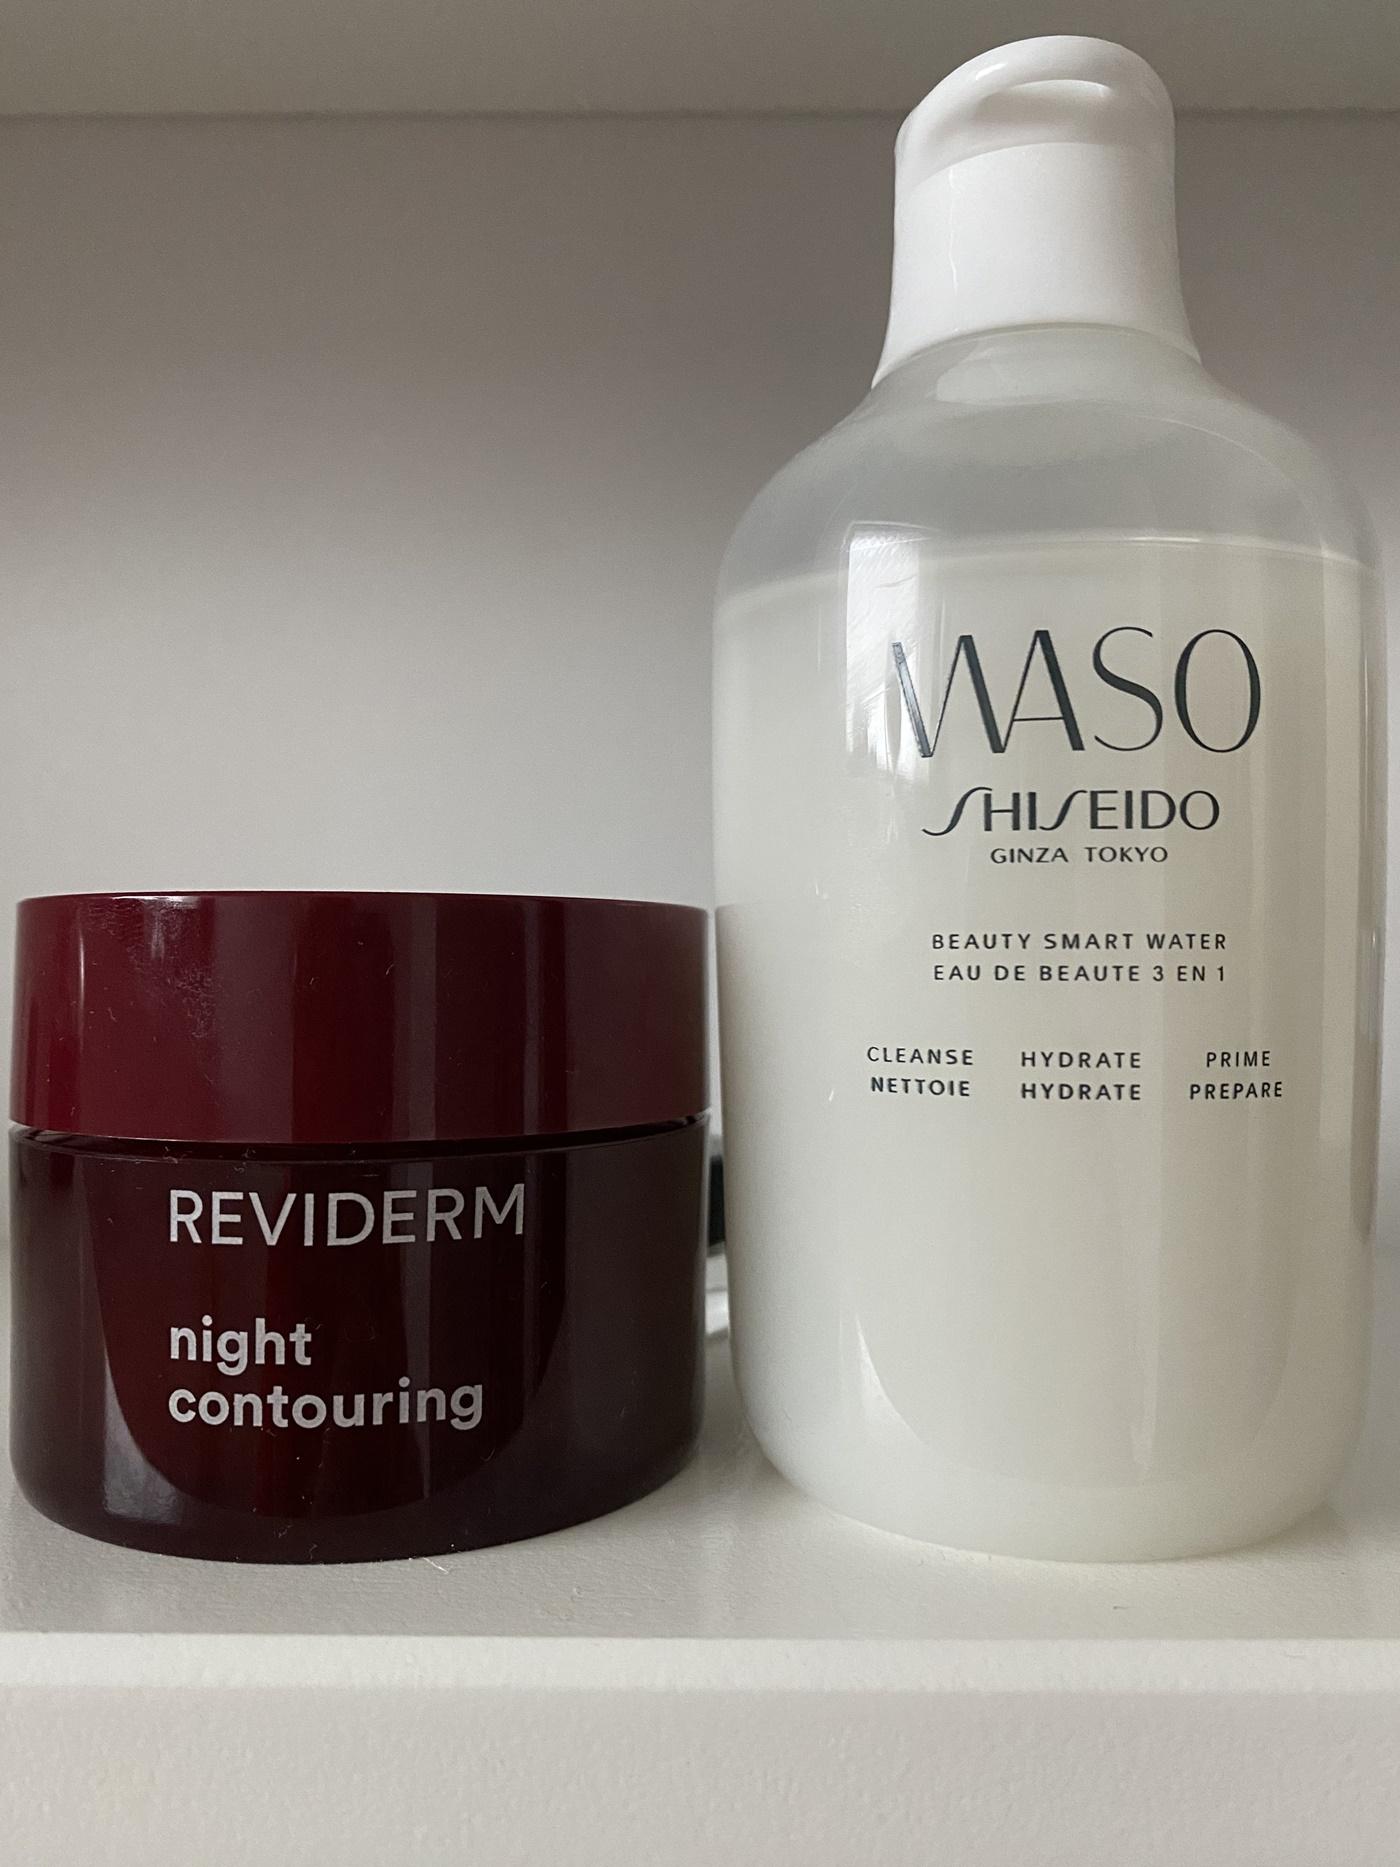 glamupyourlifestyle Koerpercreme O'keeffee's Skin Repair Apricot Pads Decollete Reviderm Nachtcreme Shiseido Smart Water Wasa